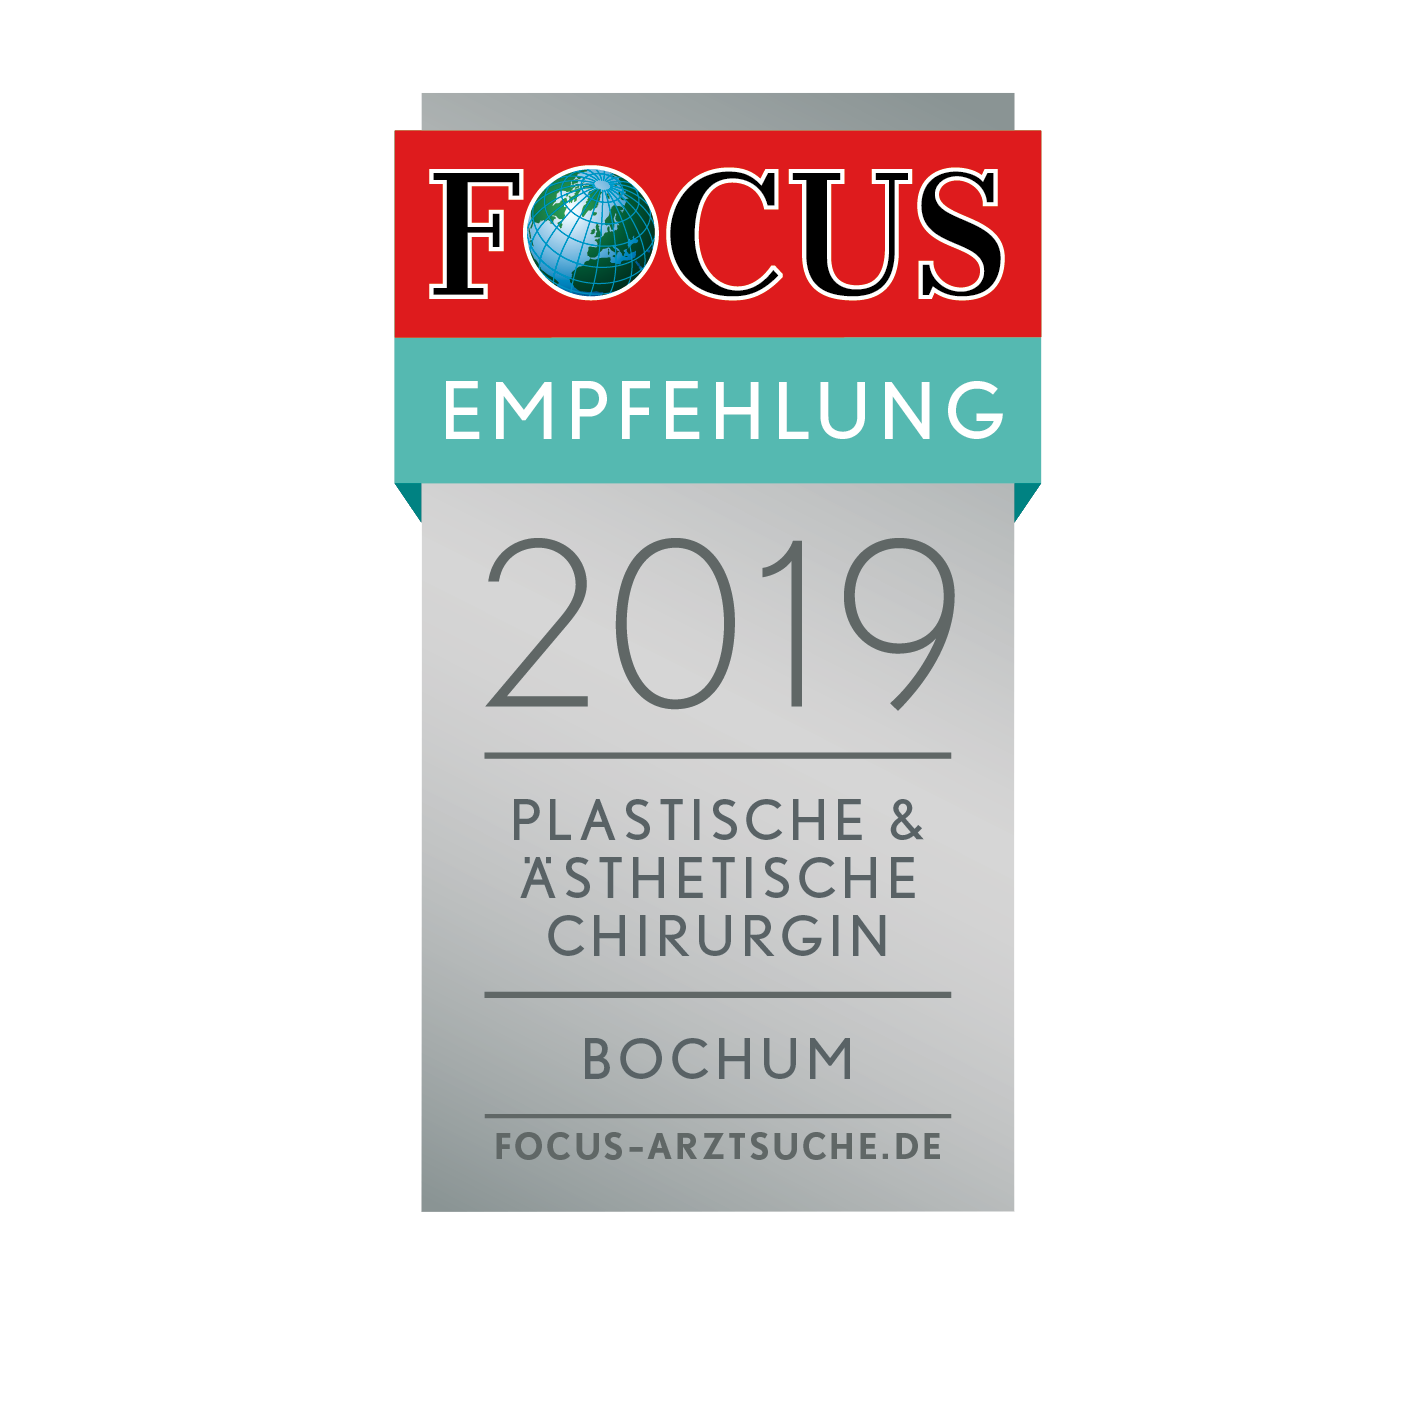 FCGA_Regiosiegel_2019_Plastische_Ästhetische_Chirurgin_Bochum